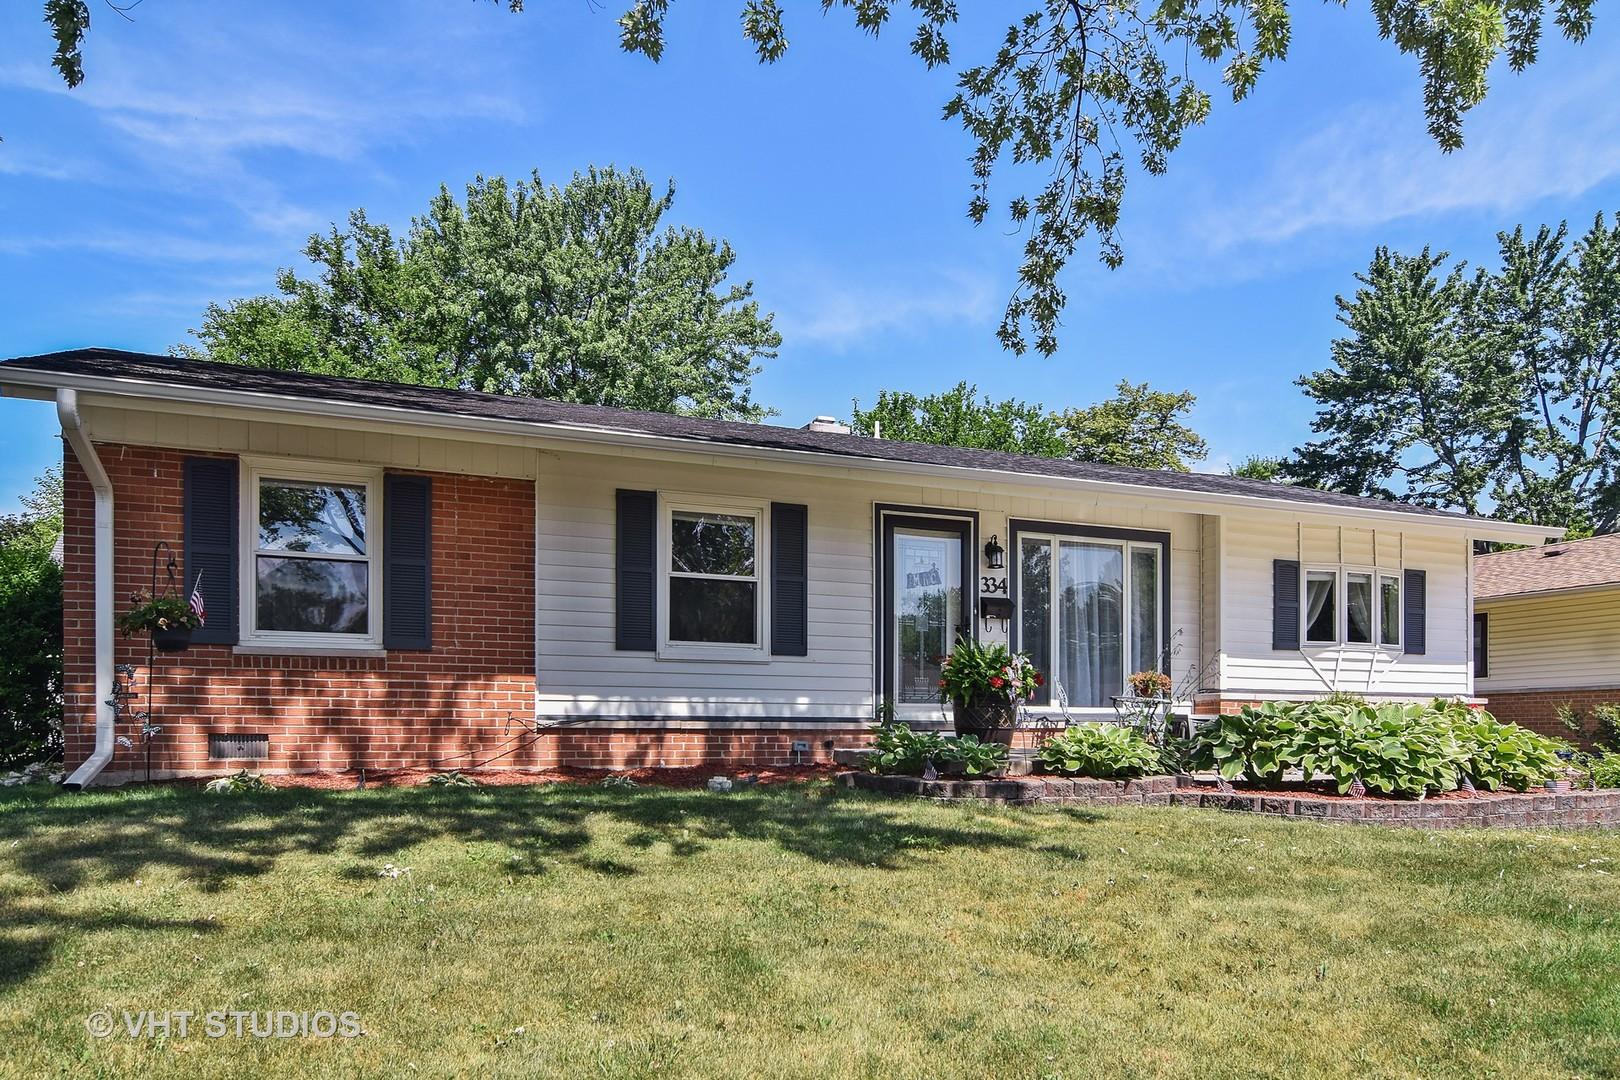 334 Charing Cross ,Elk Grove Village, Illinois 60007